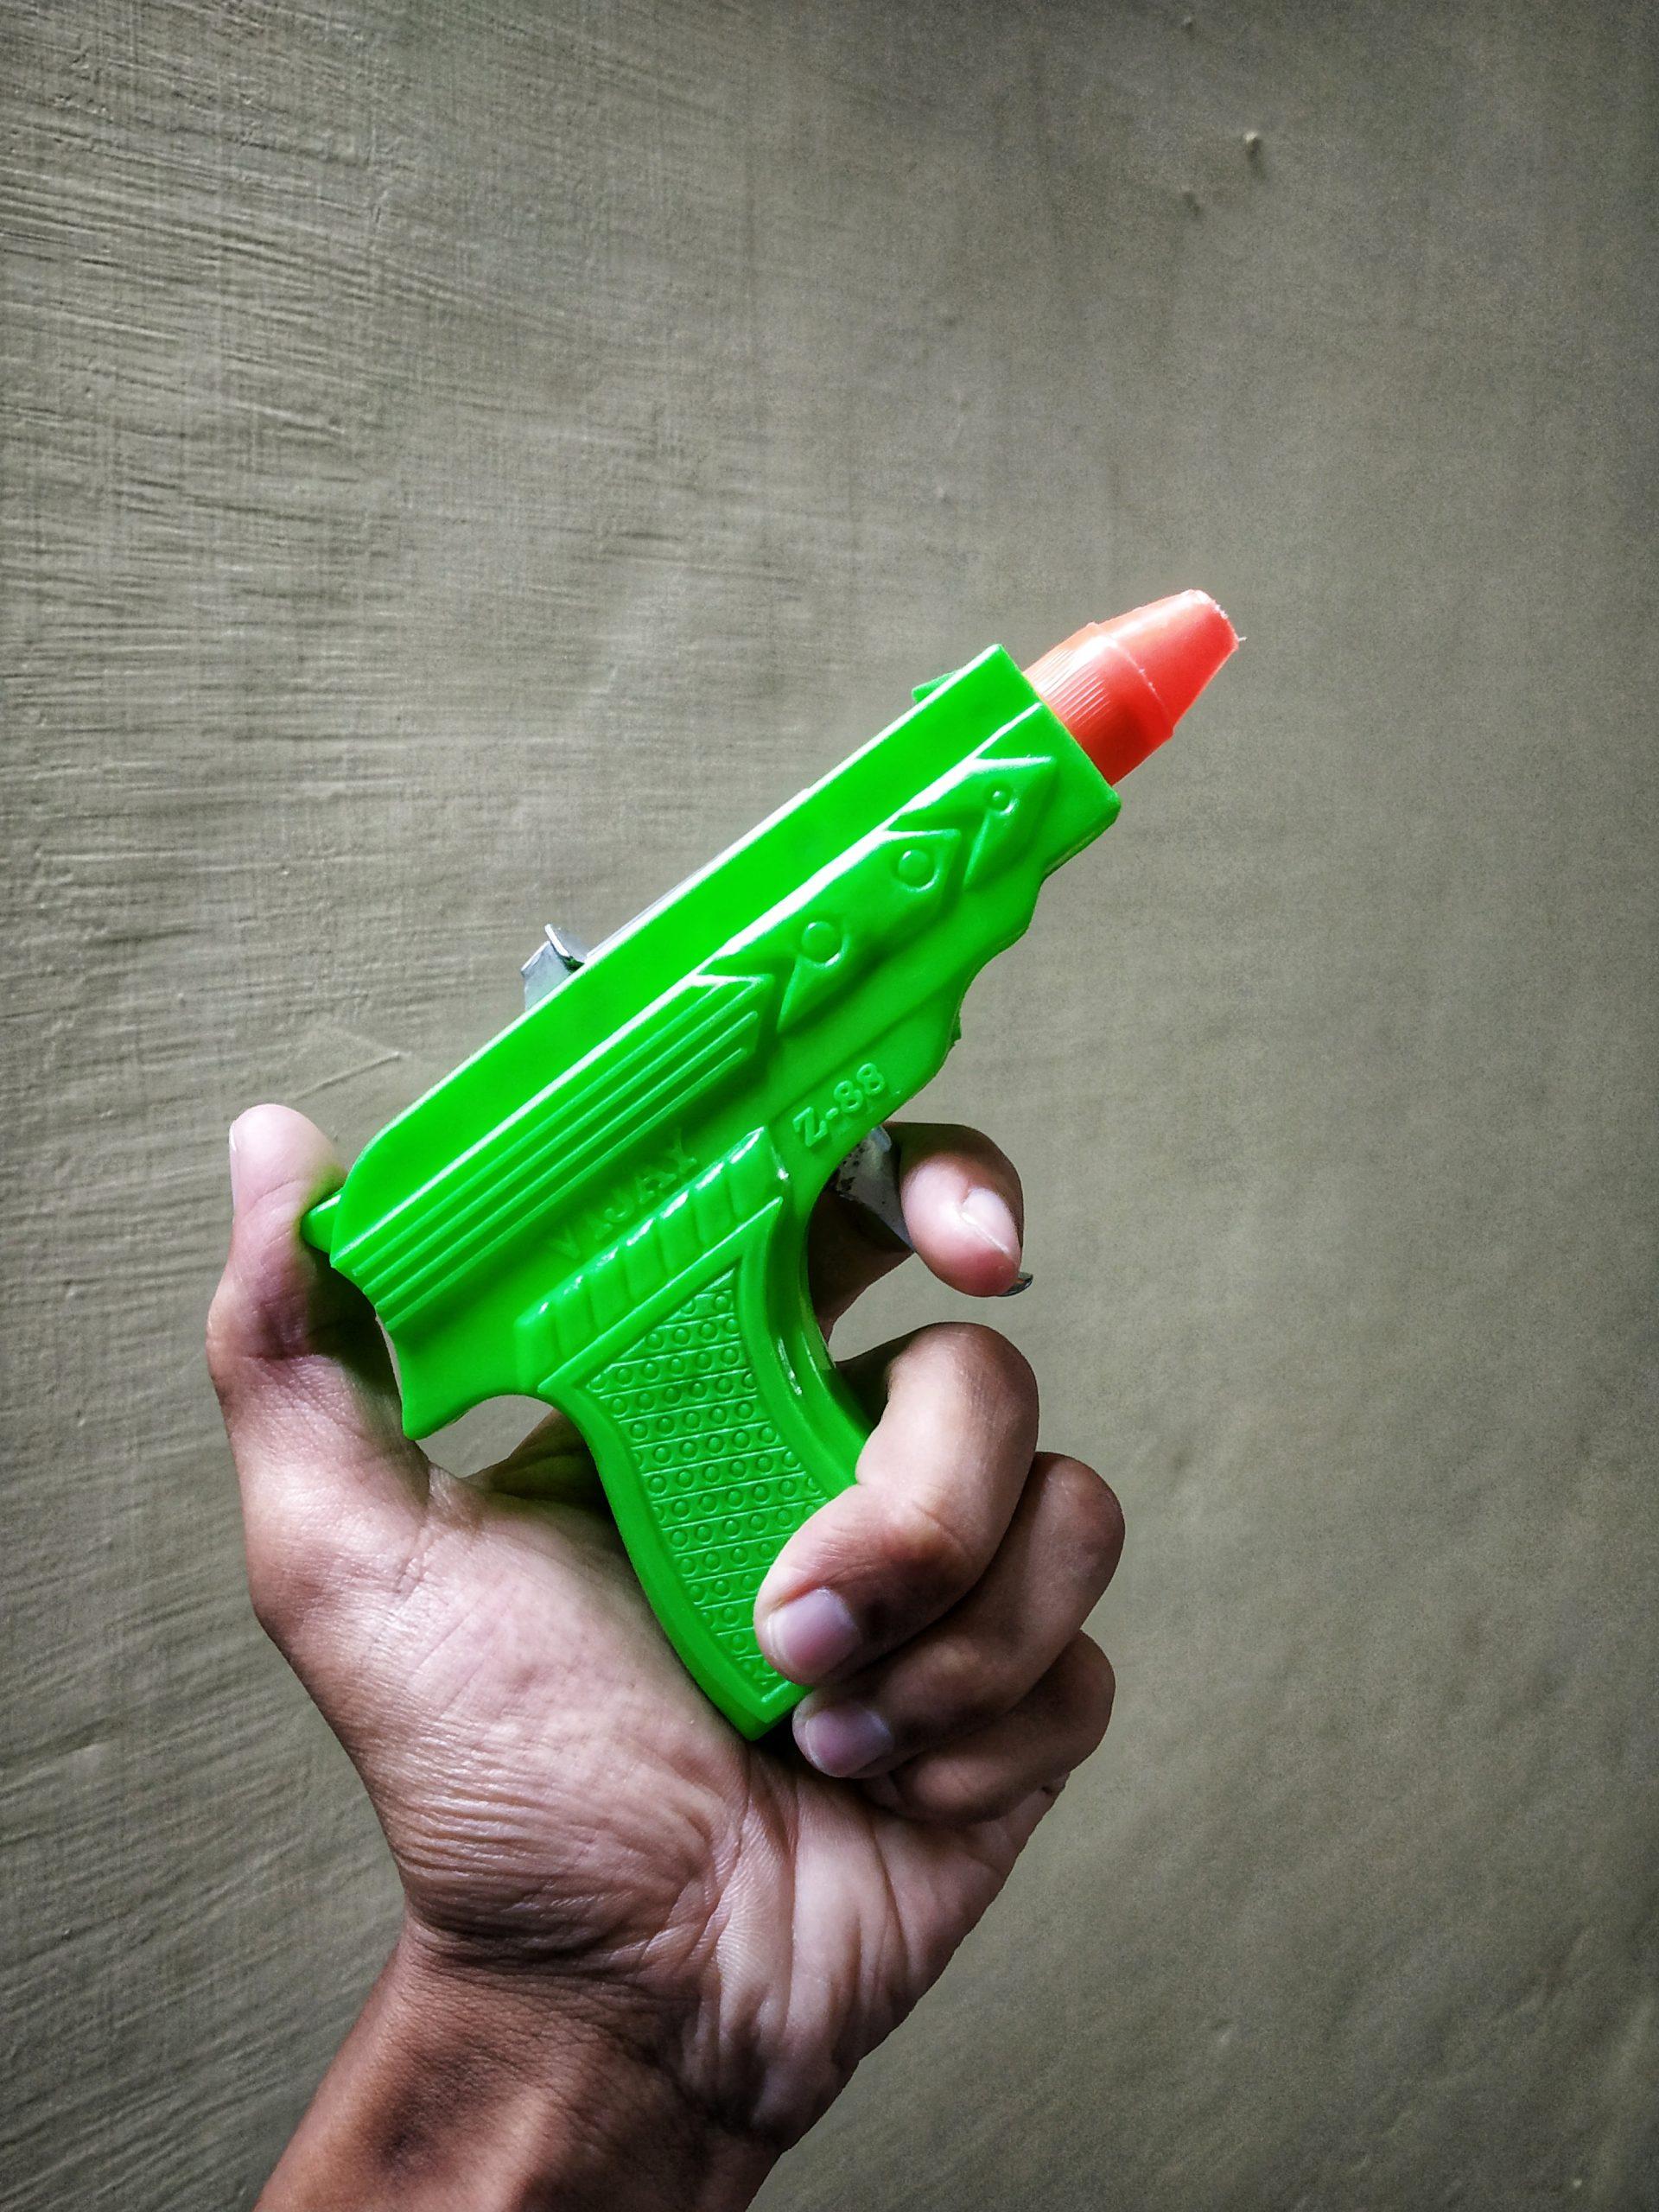 A toy gun